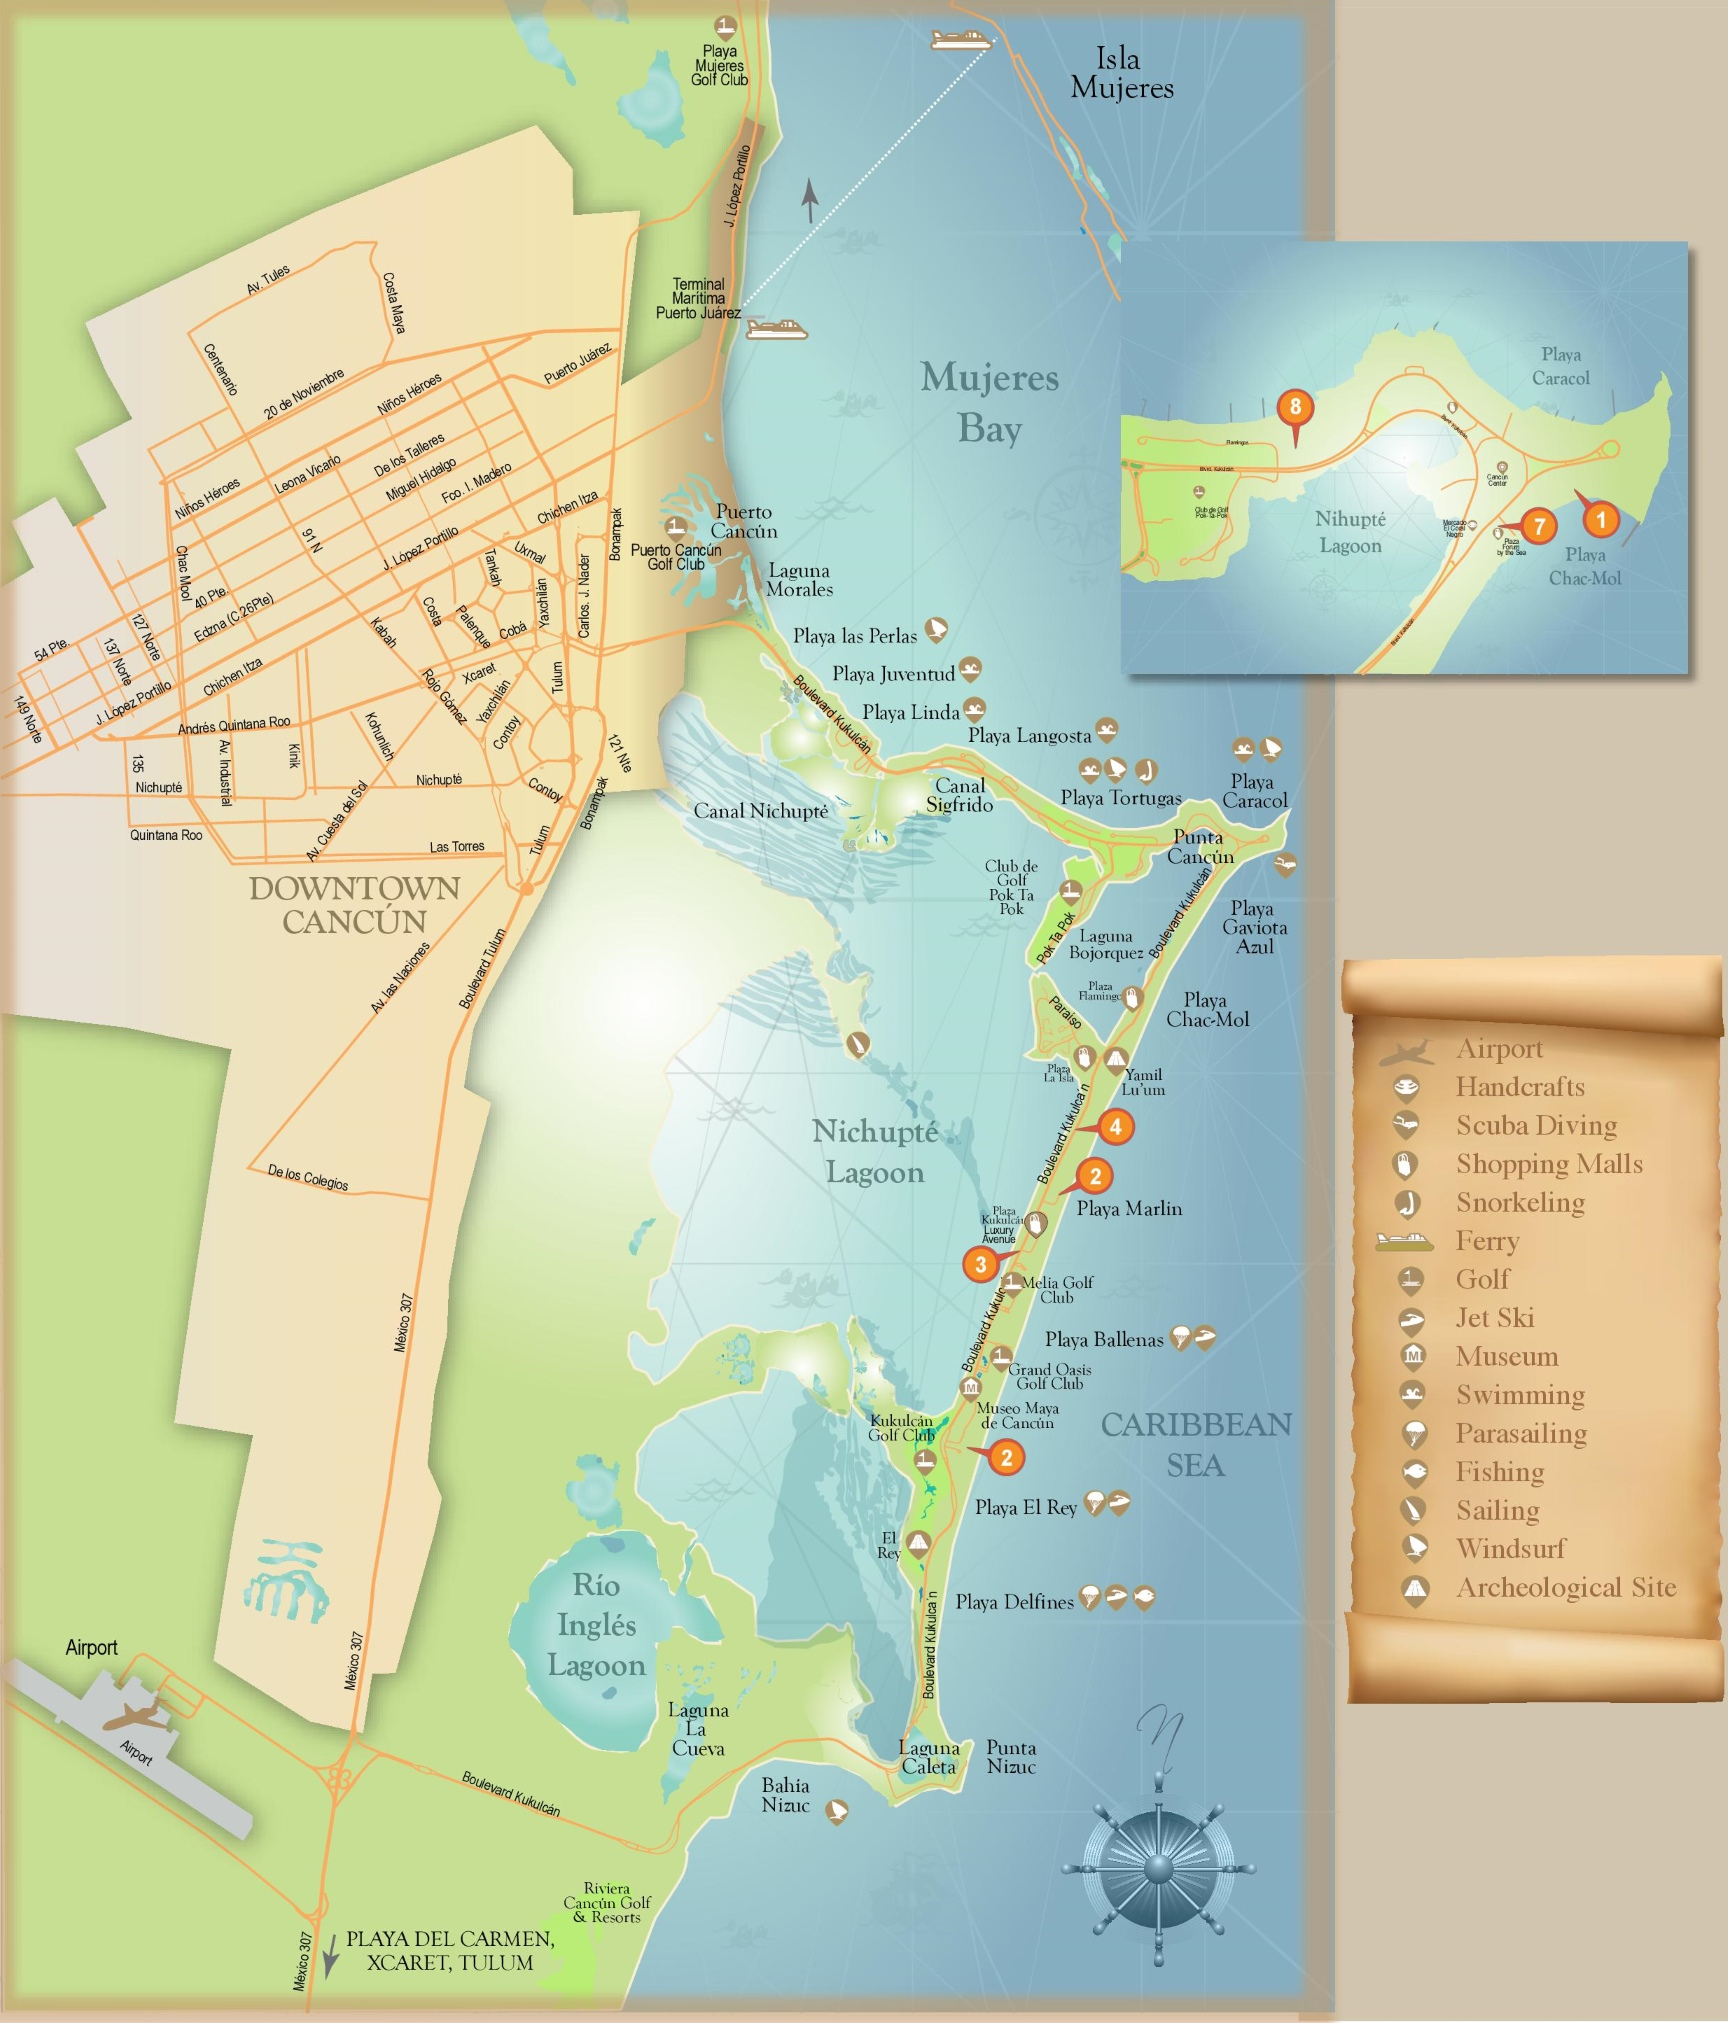 Cancn tourist map